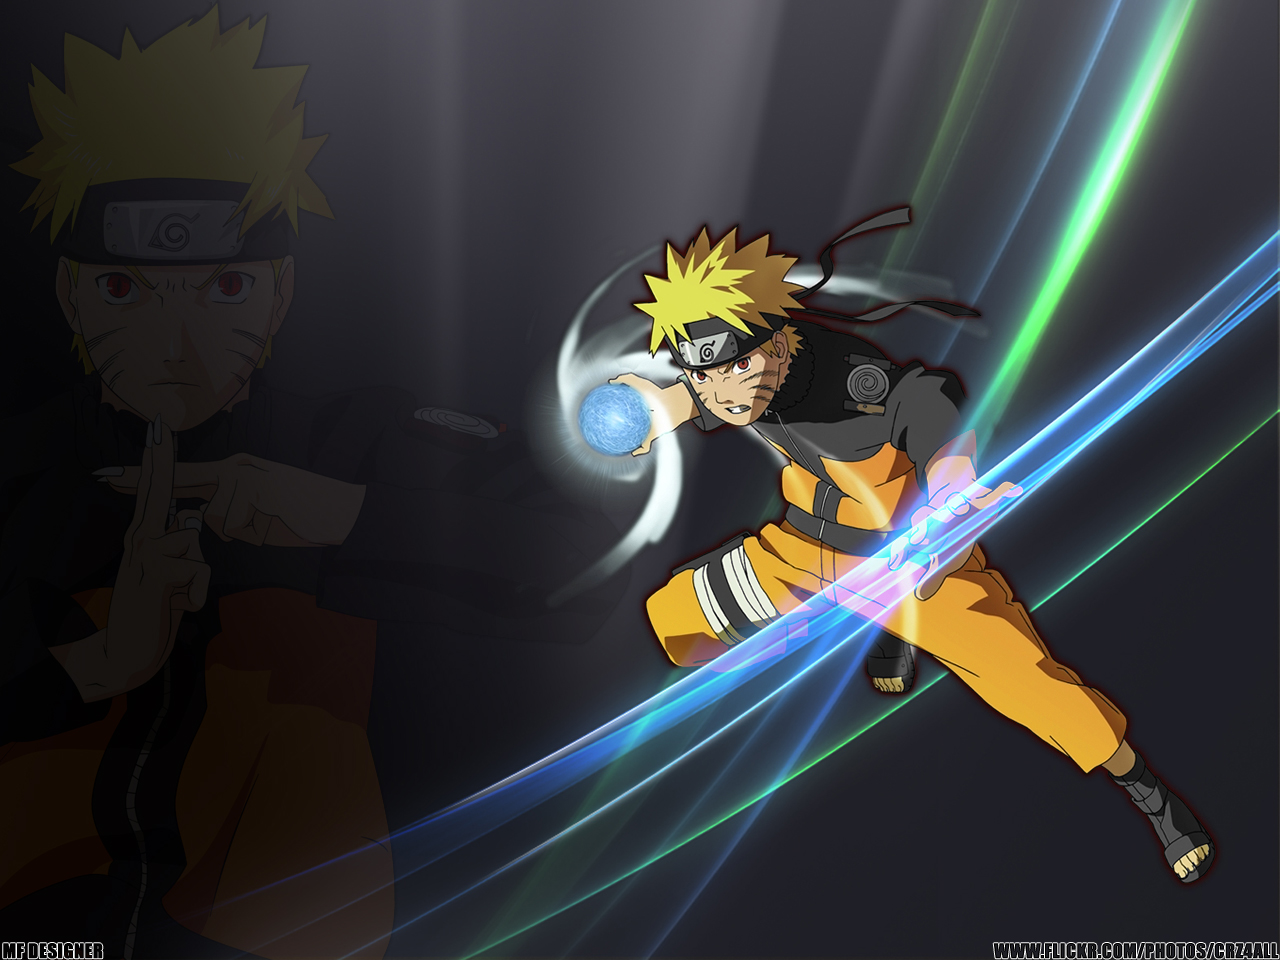 Sasuke Uchiha – Naruto Shippuuden Wallpaper · Sasuke Uchiha PSP Wallpaper